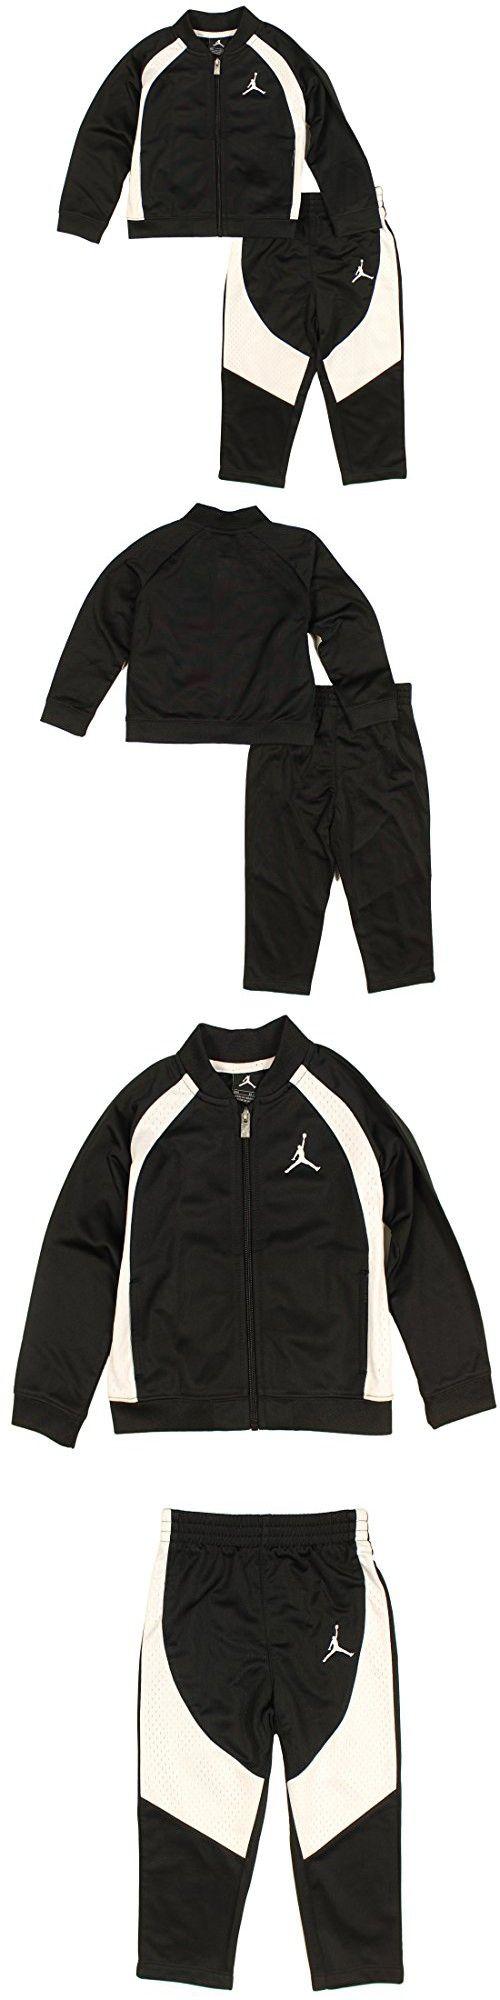 89de1598a8e NIKE Jordan Jumpman Little Boys' Tracksuit Set, Jacket and Pants Outfit